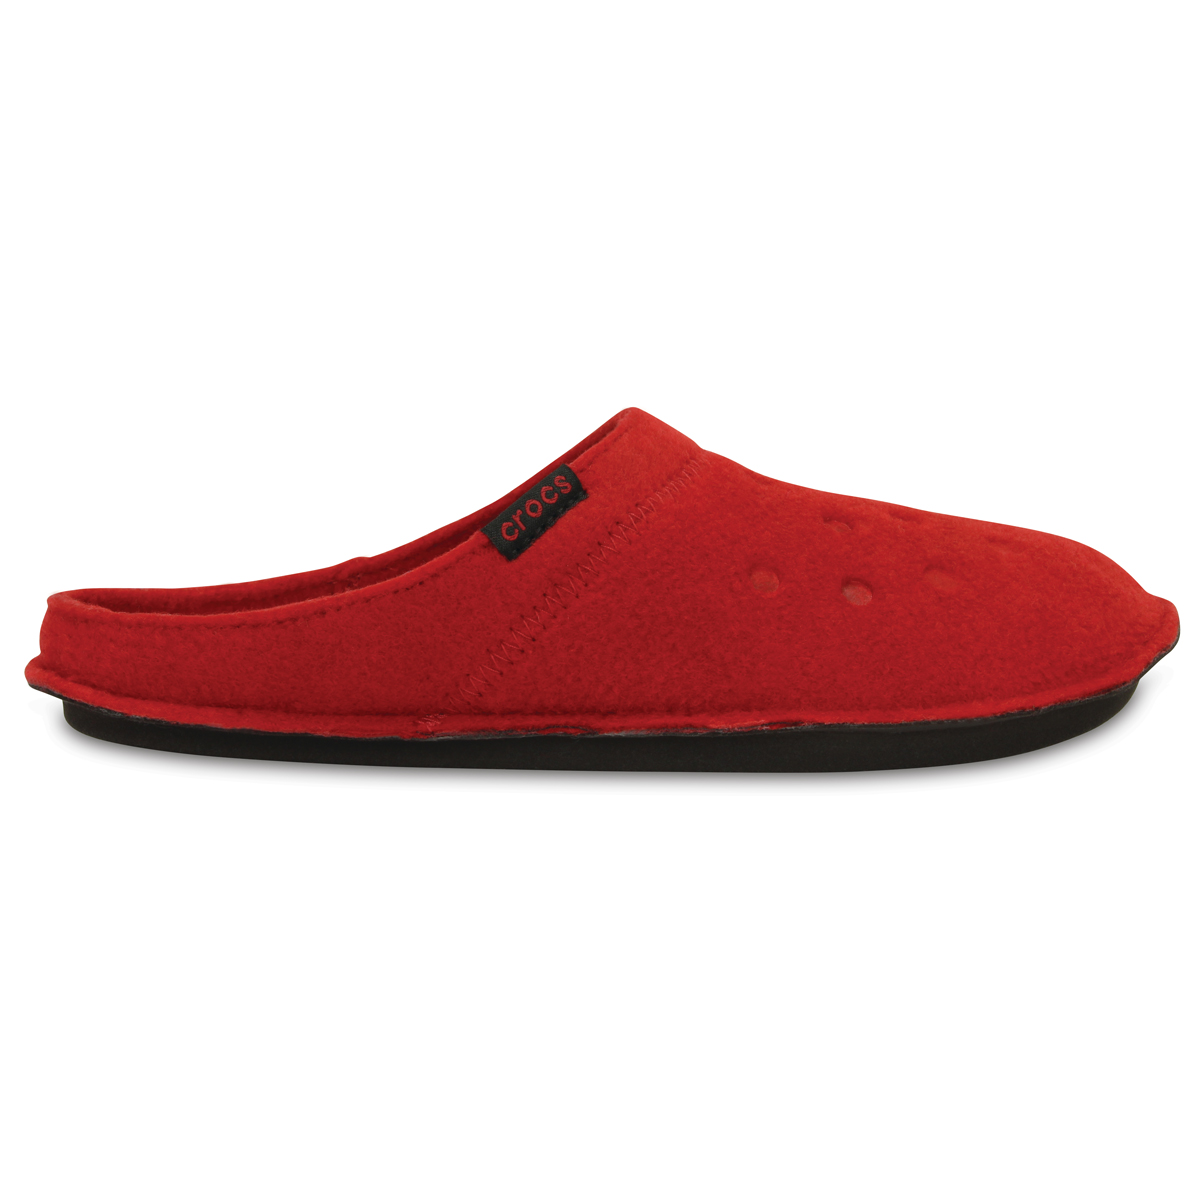 Classic Slipper - Kırmızı Biber/Yulaf